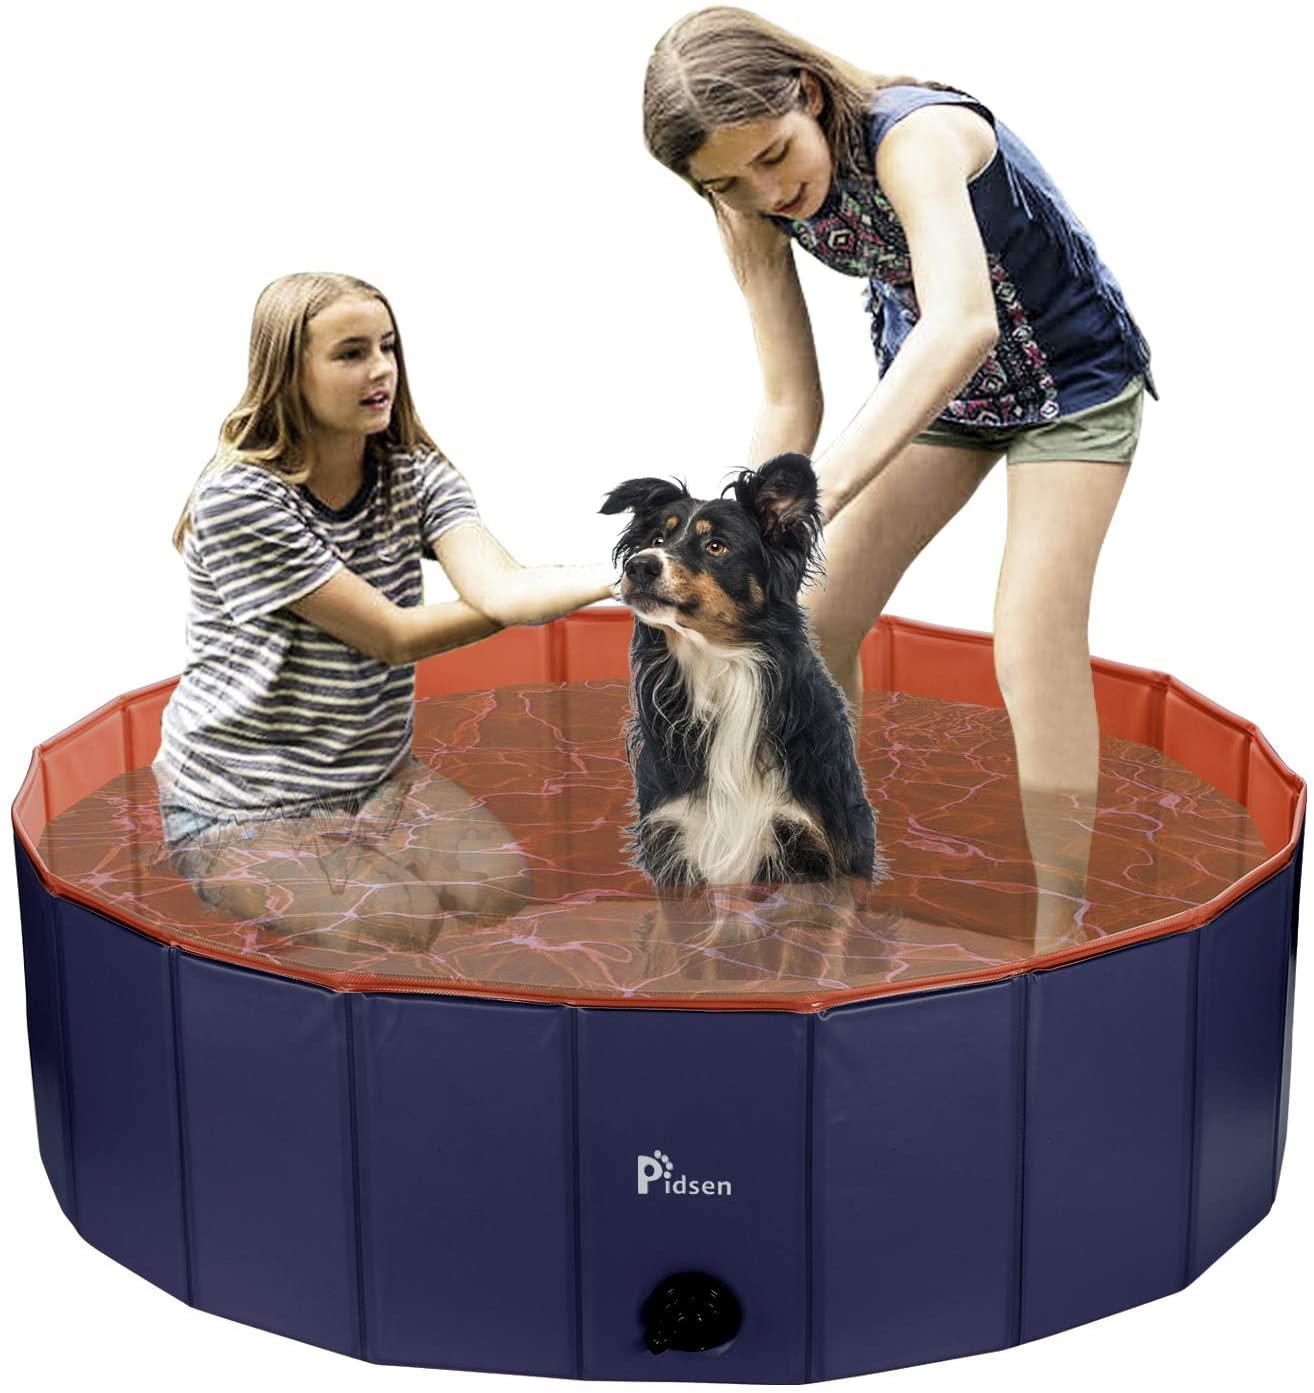 Pidsen-Swimming-Pool-Dog-Bath-Pets-Paddling-Pool